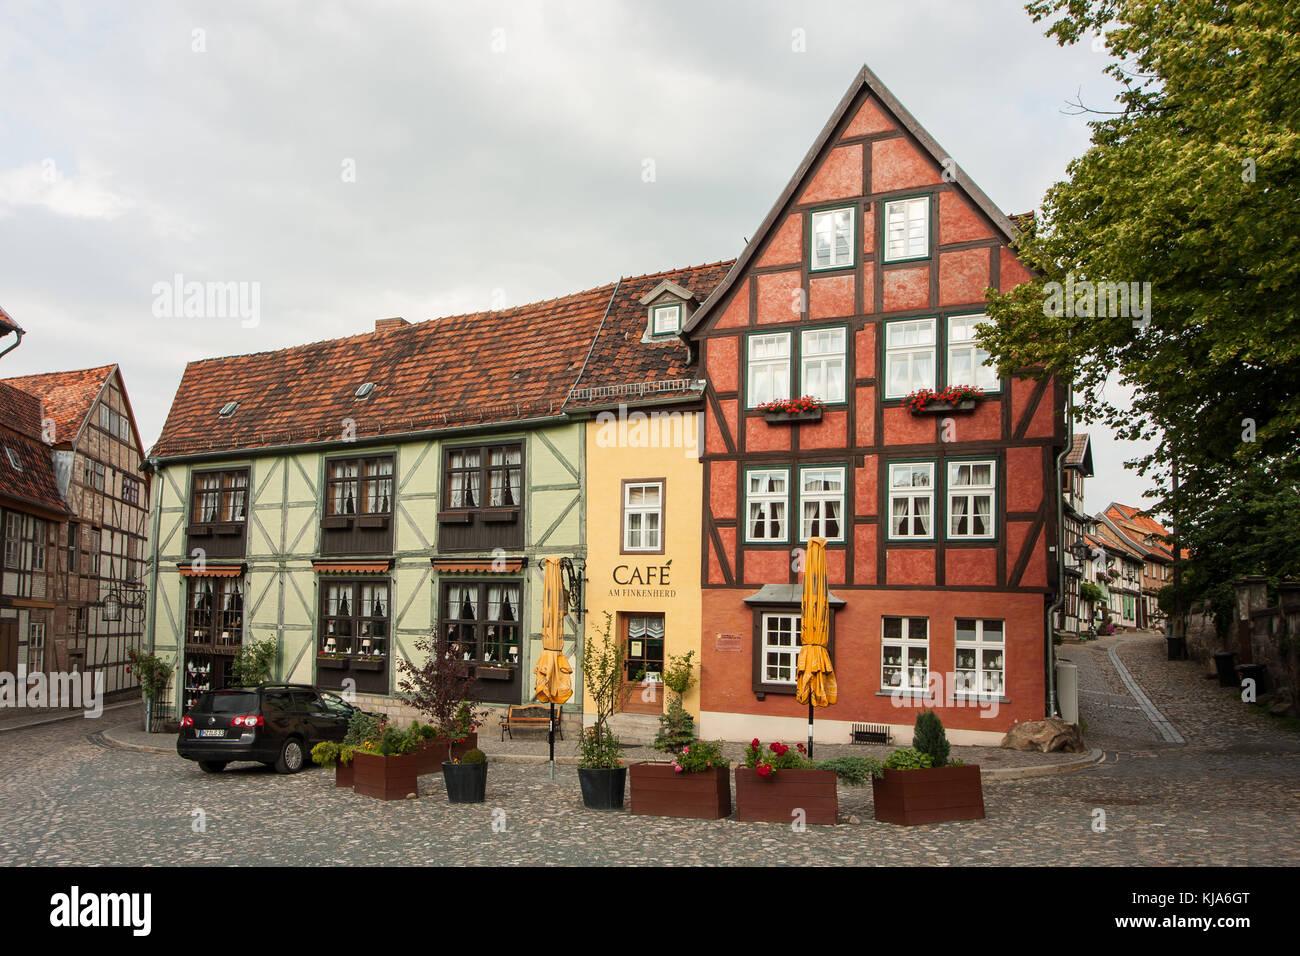 Quedlinburg Cafe Am Finkenherd Stock Photo